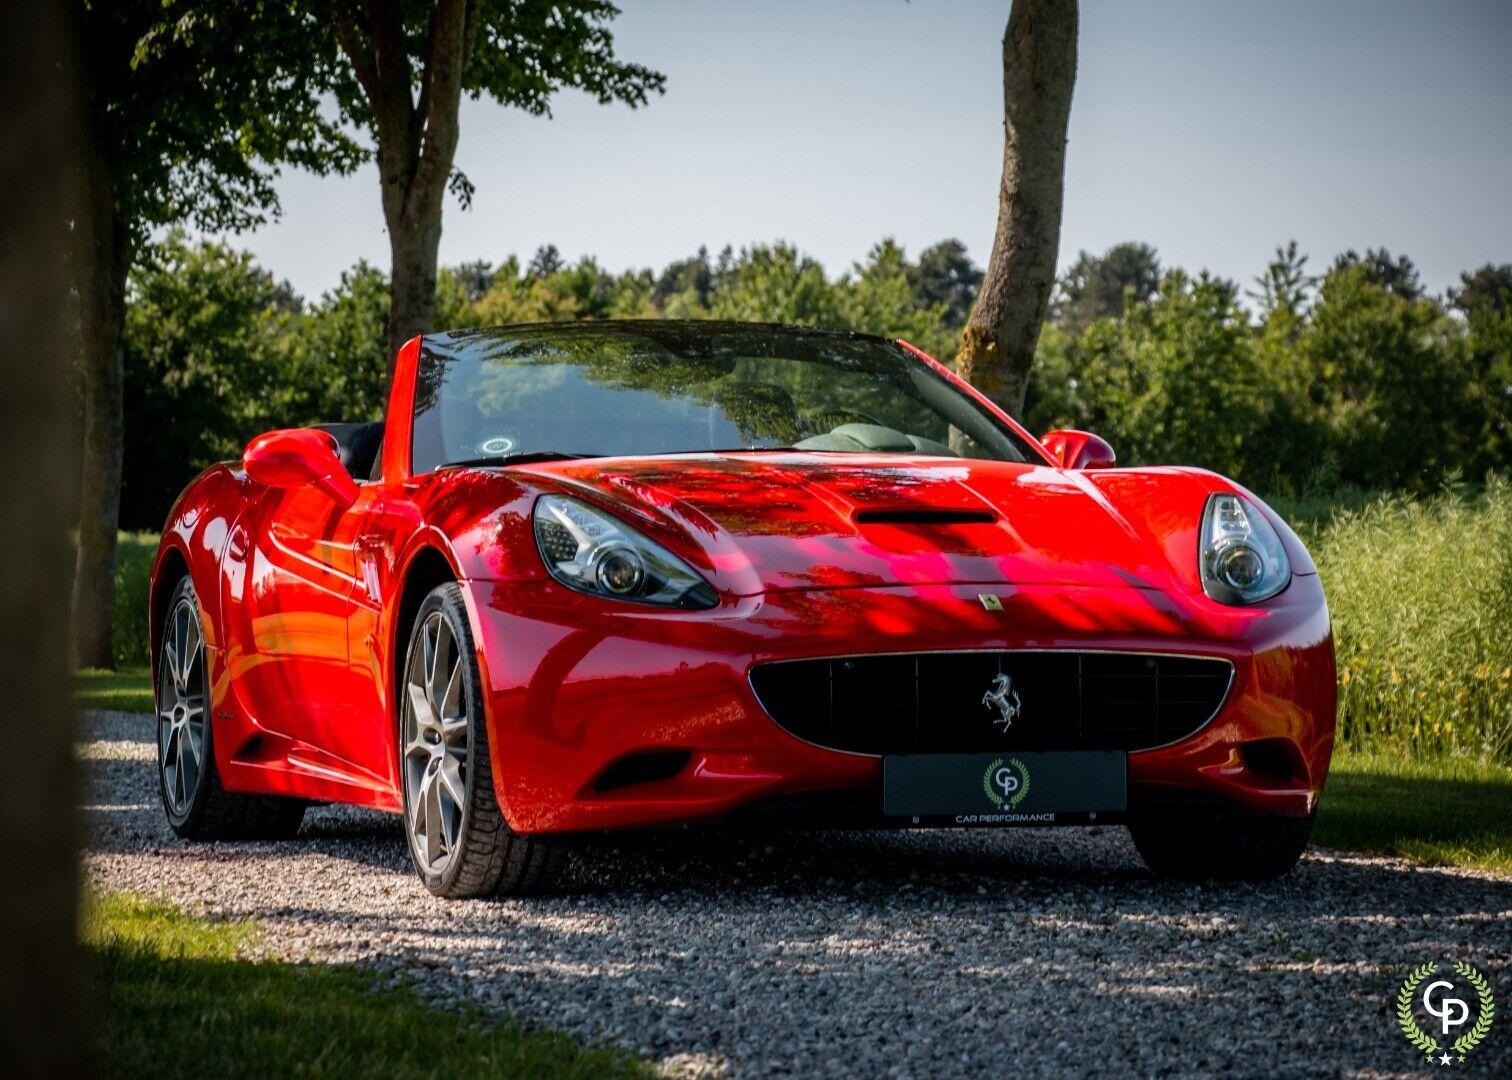 Ferrari California 4,3 F1 2d - 4.244 kr.